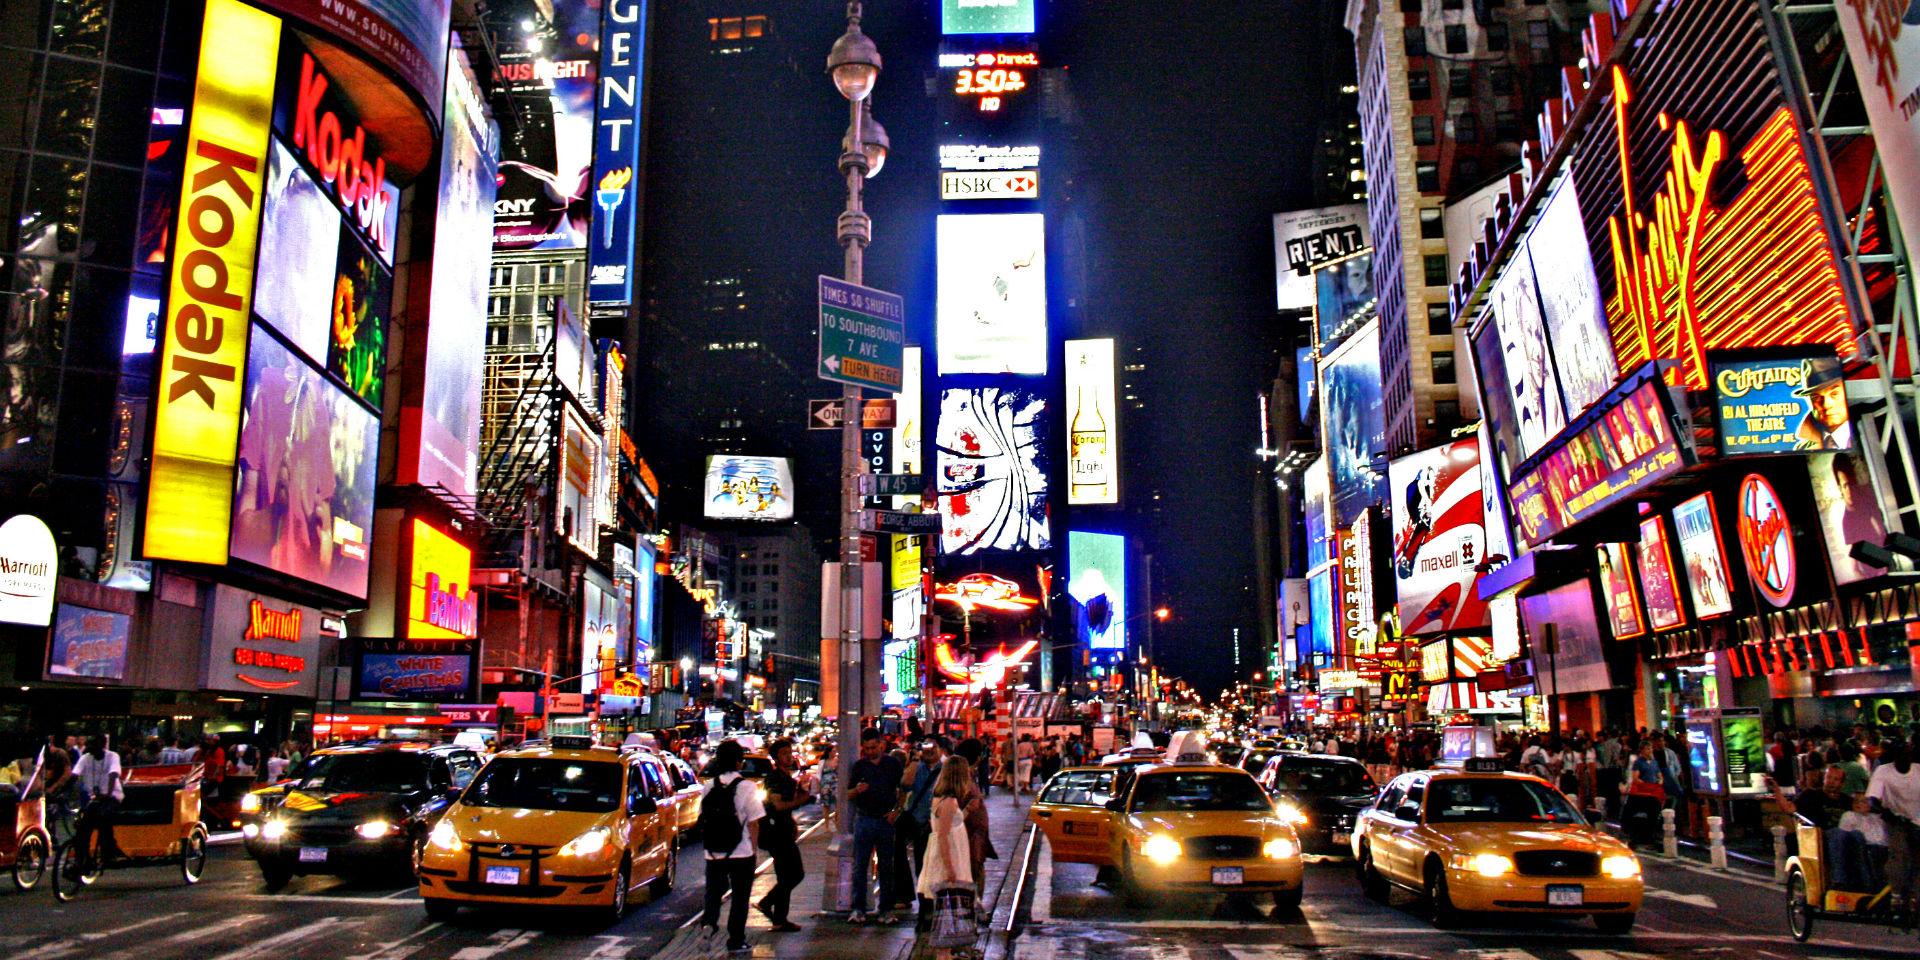 New York Hotel Room Tax